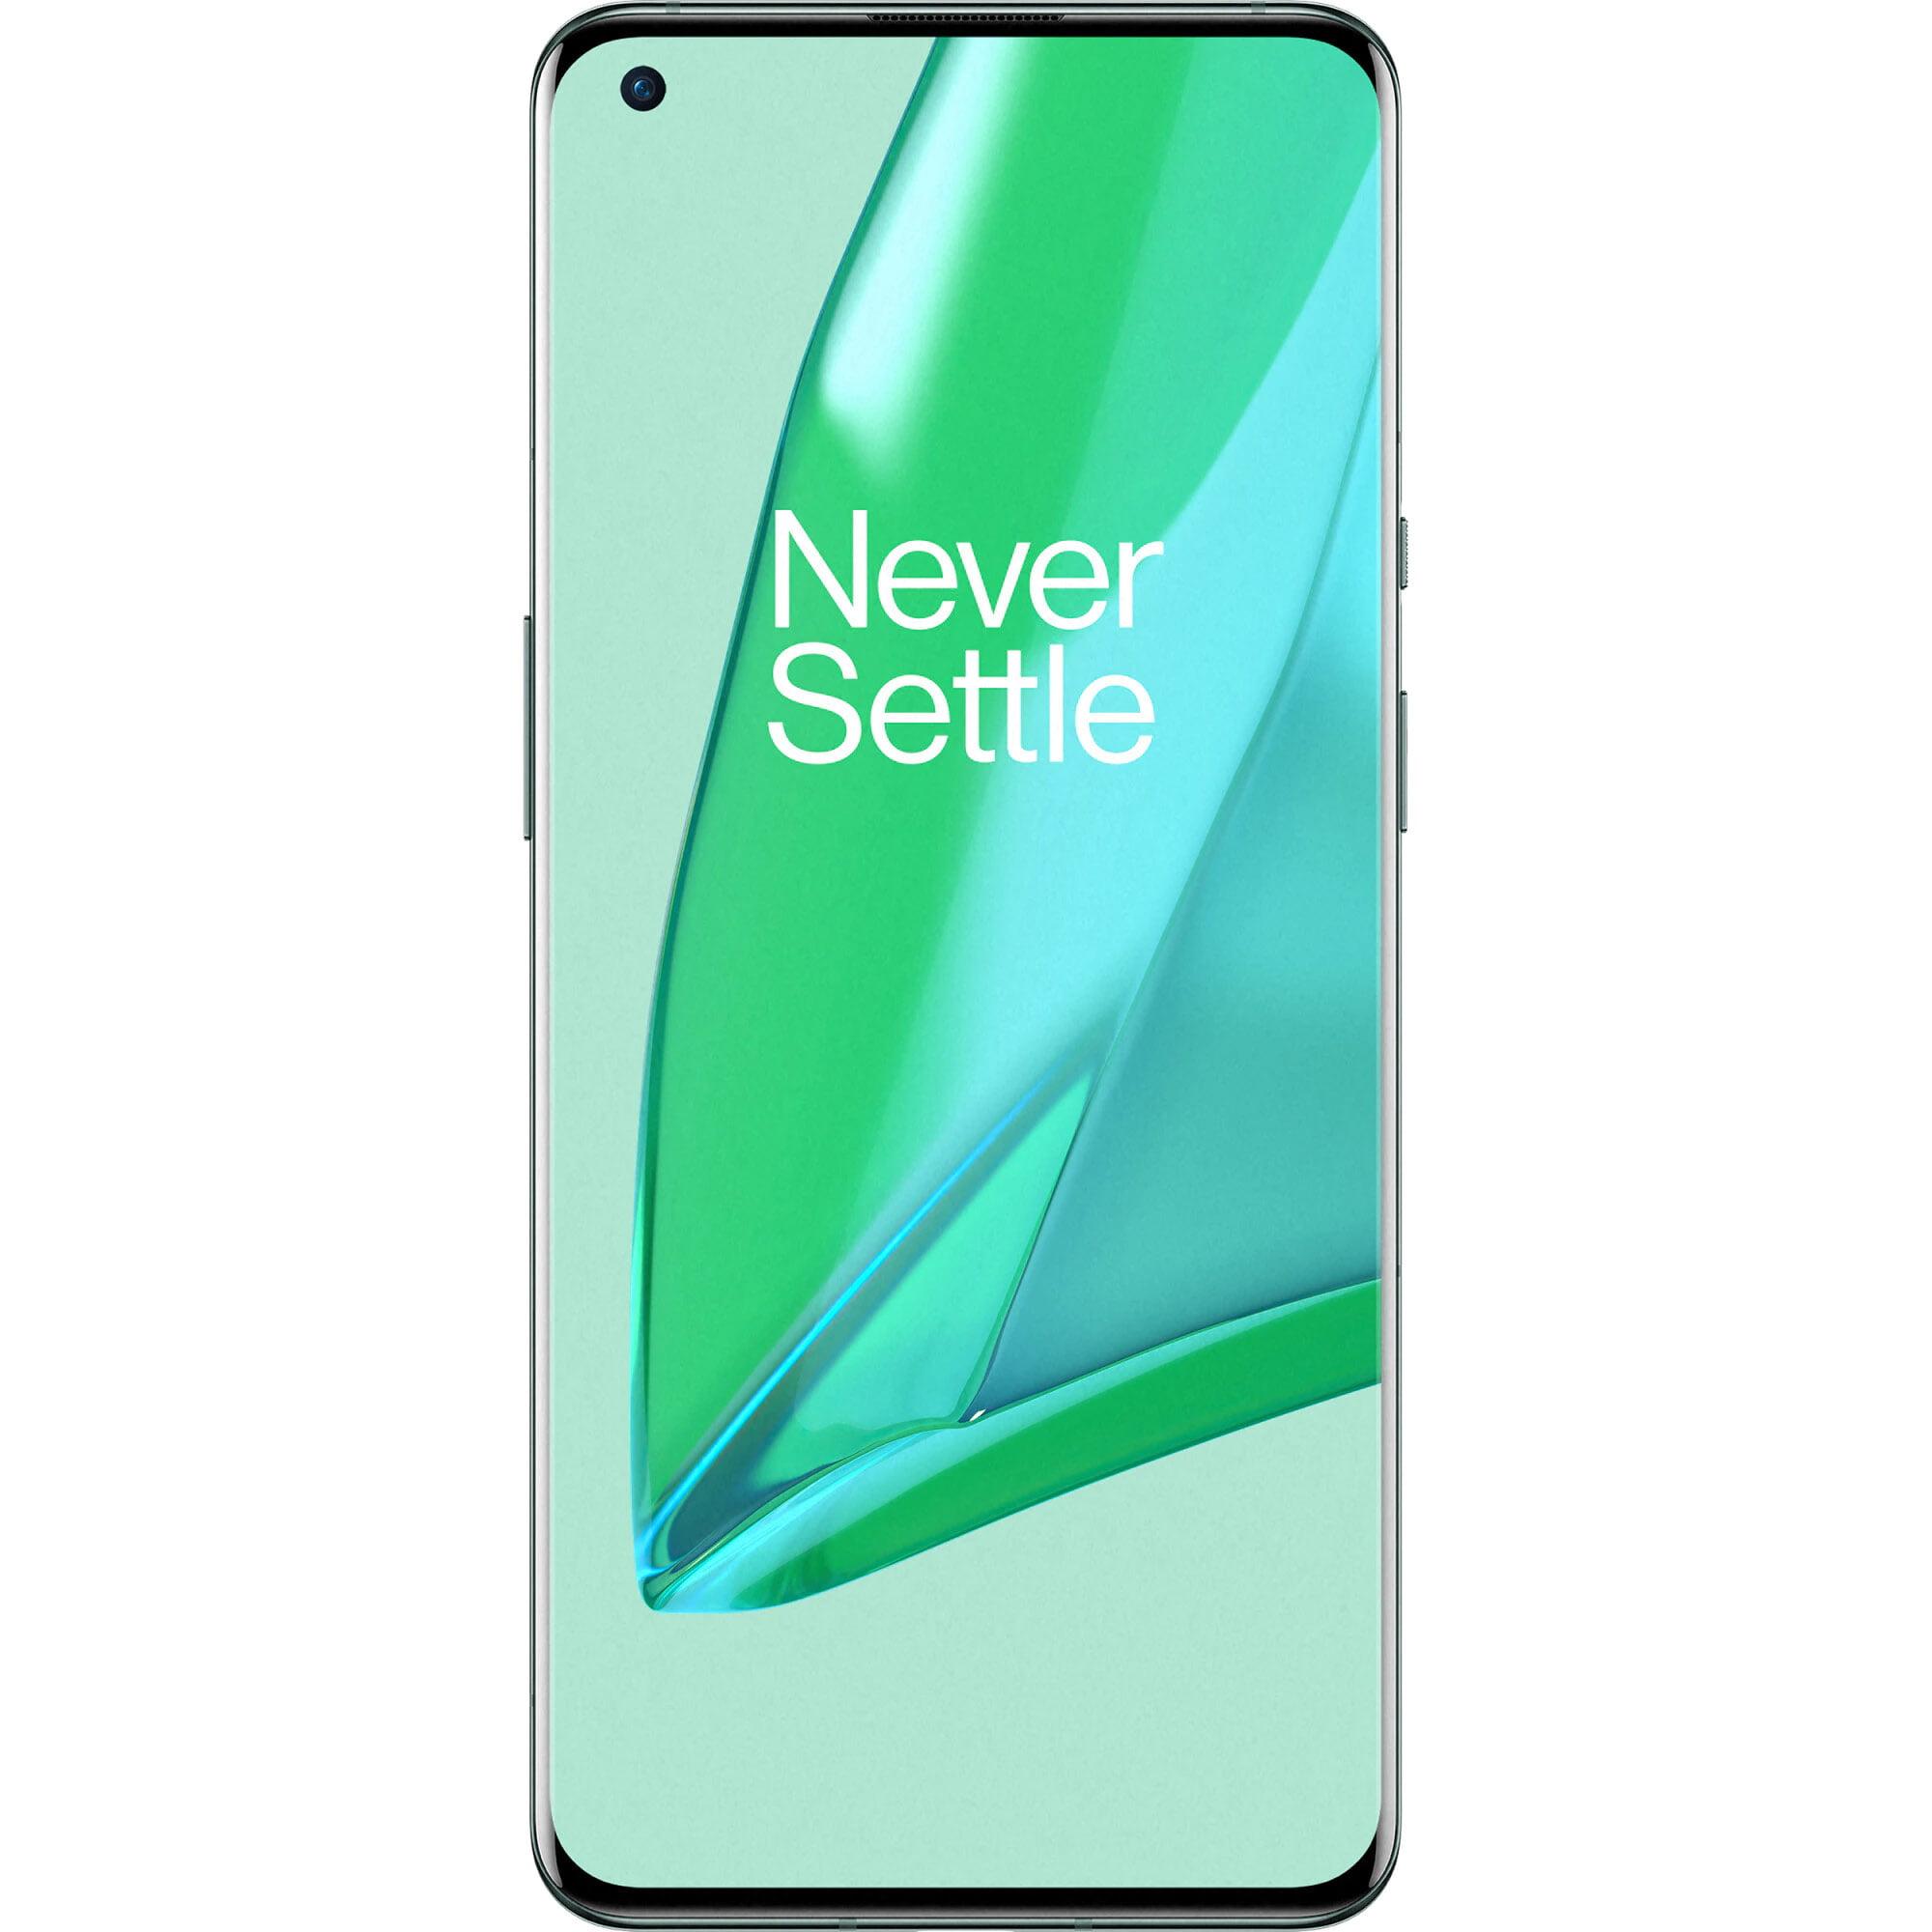 Telefon mobil OnePlus 9 Pro, Dual SIM, 256GB, 8GB RAM, 5G, Pine Green